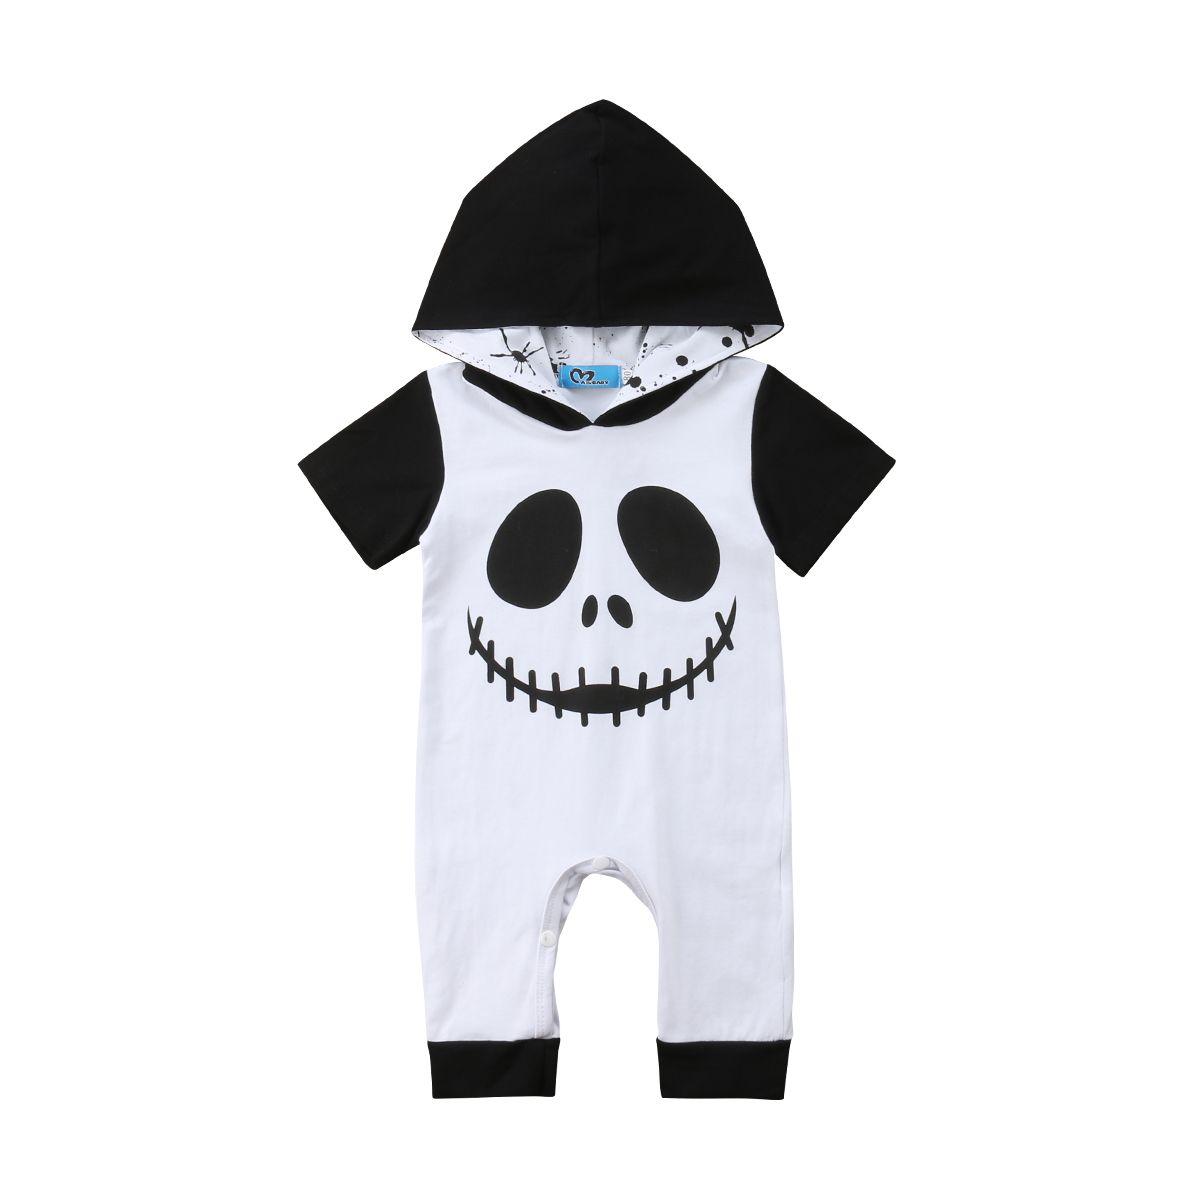 UK Newborn Baby Boy Halloween Imp Clothes Hooded Romper Jumpsuit Bodysuit Outfit